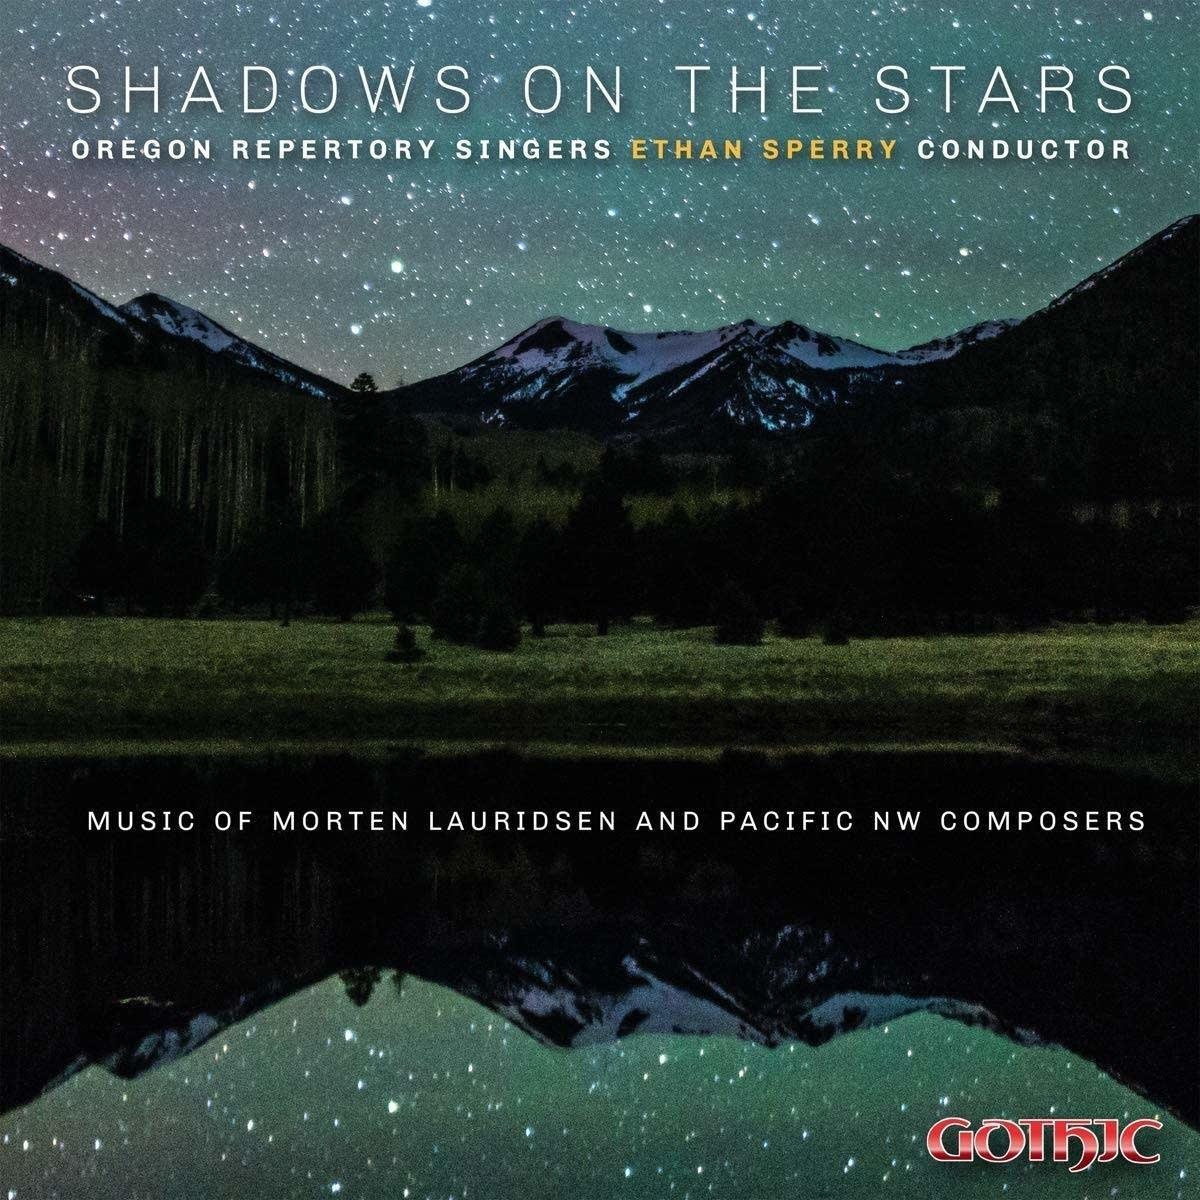 'Shadows on the Stars'